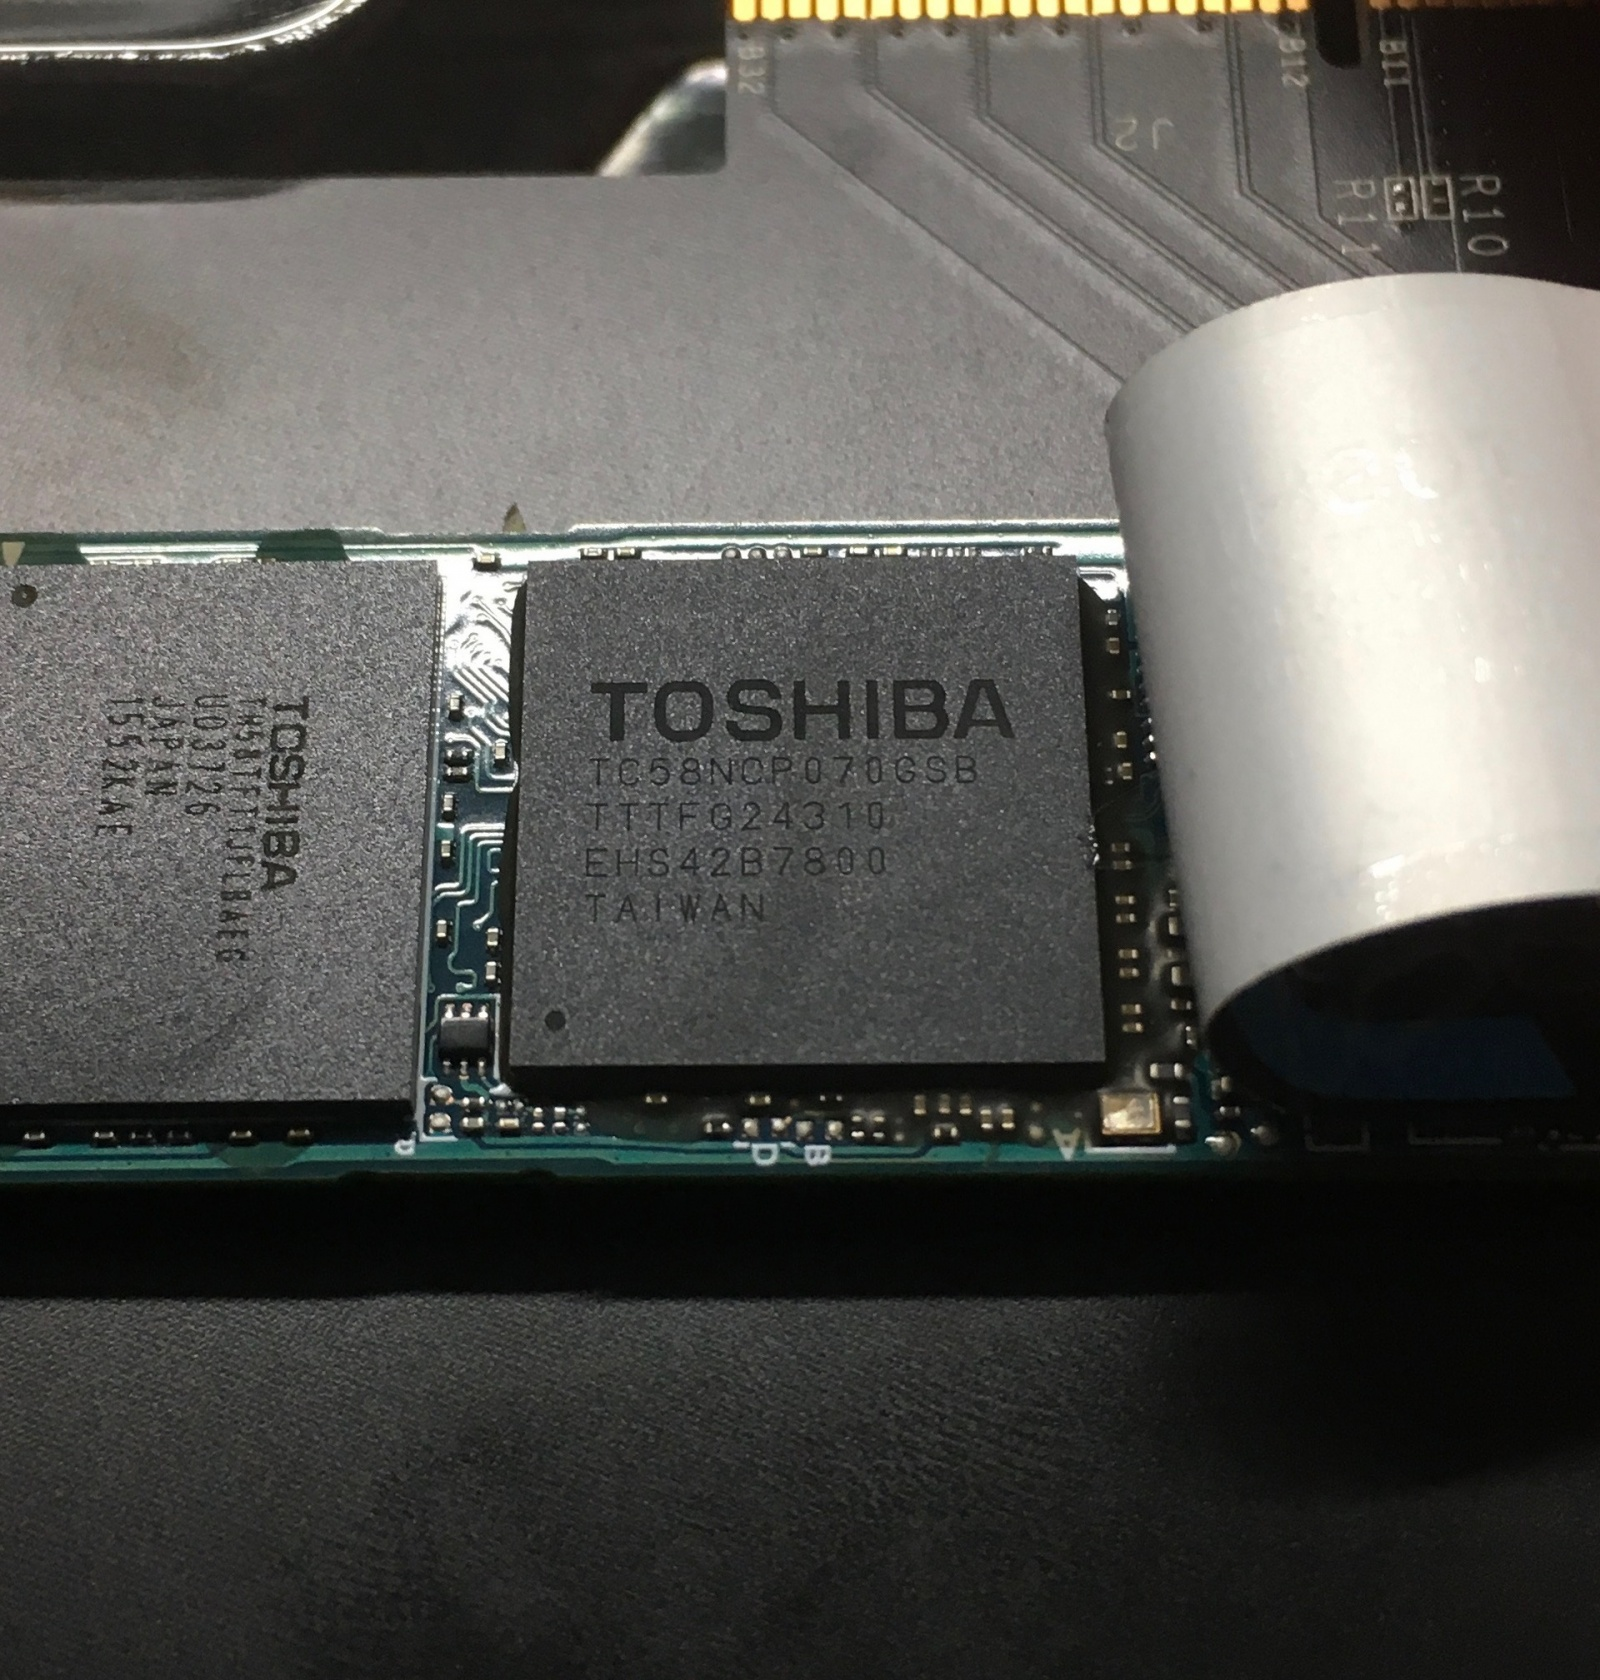 Обзор SSD накопителя OCZ RD400 — Citius, Altius, Fortius - 11